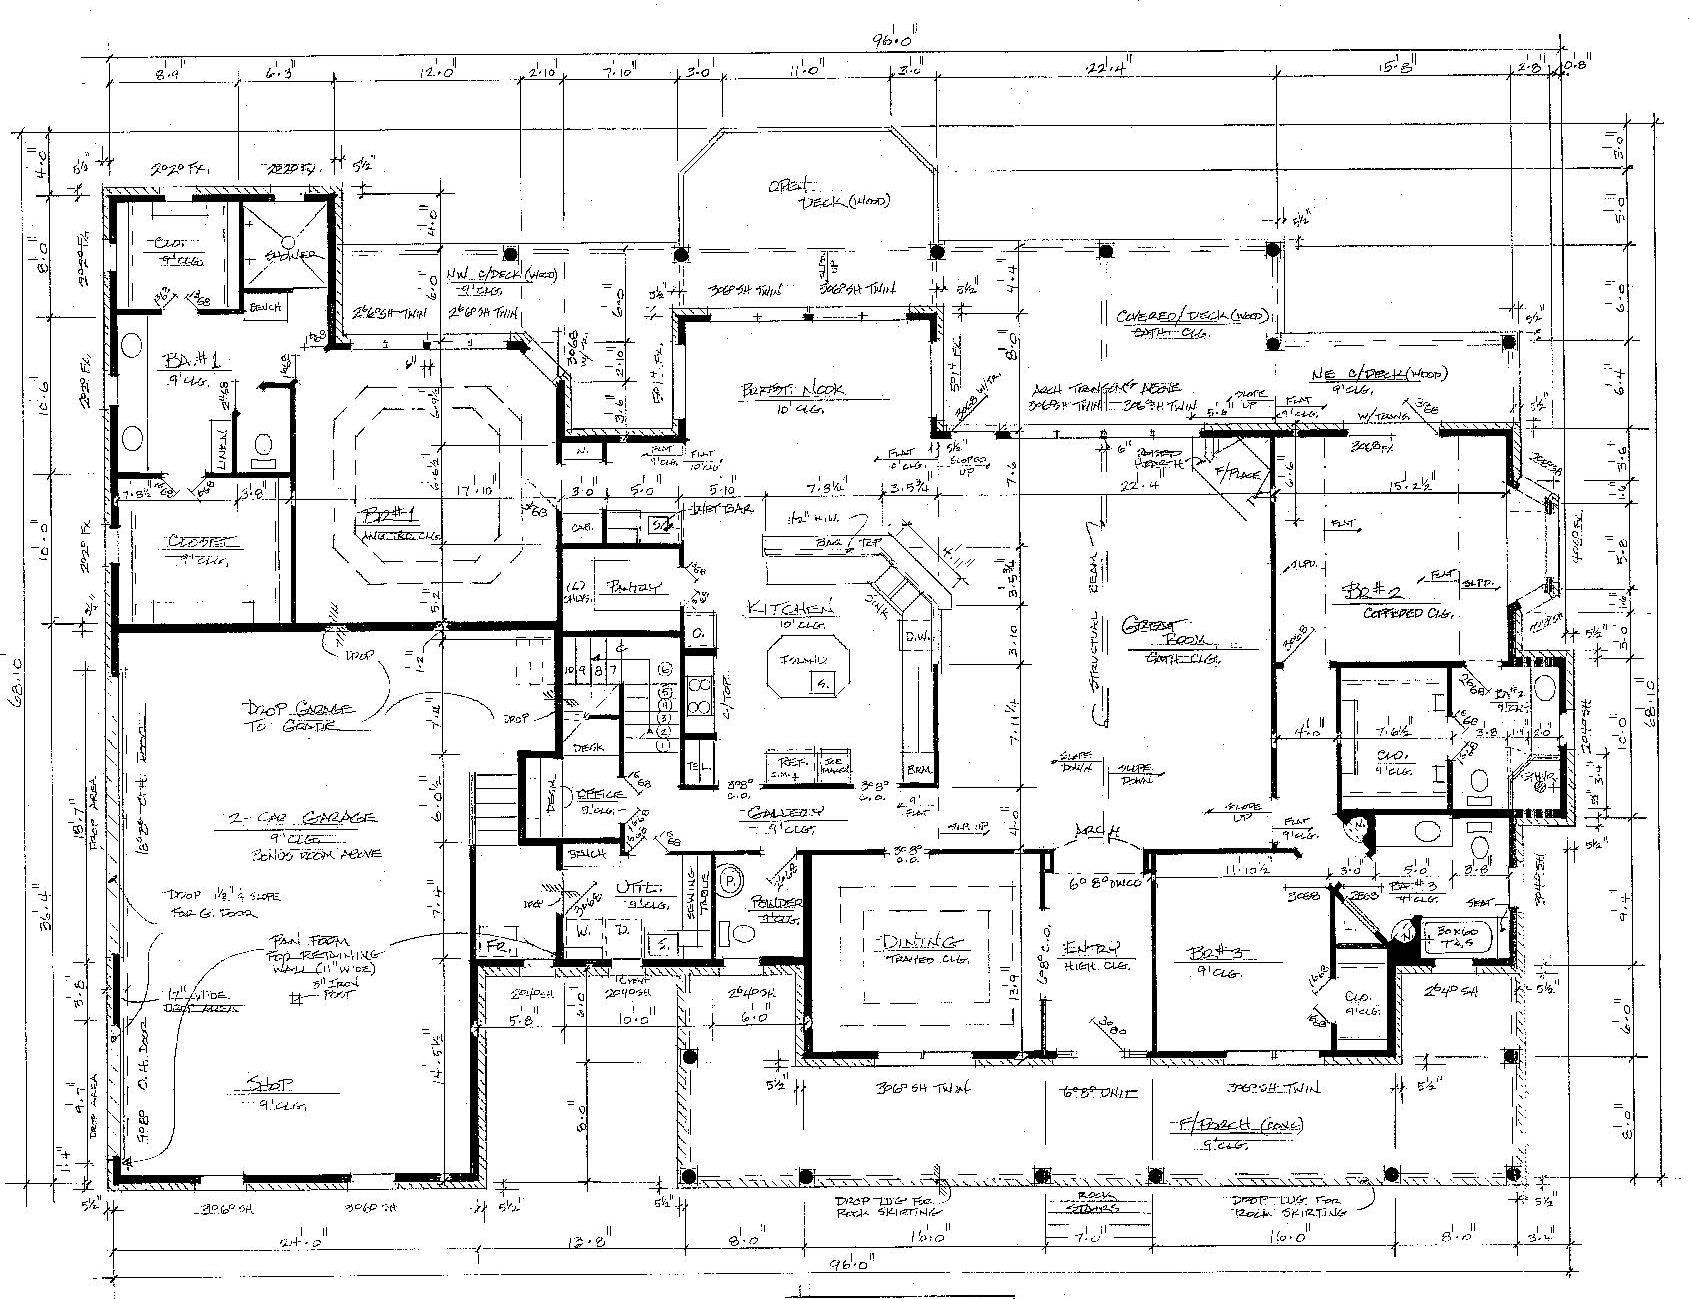 1689x1299 Splendid Design Ideas Home Architect Blueprints 11 House Plan